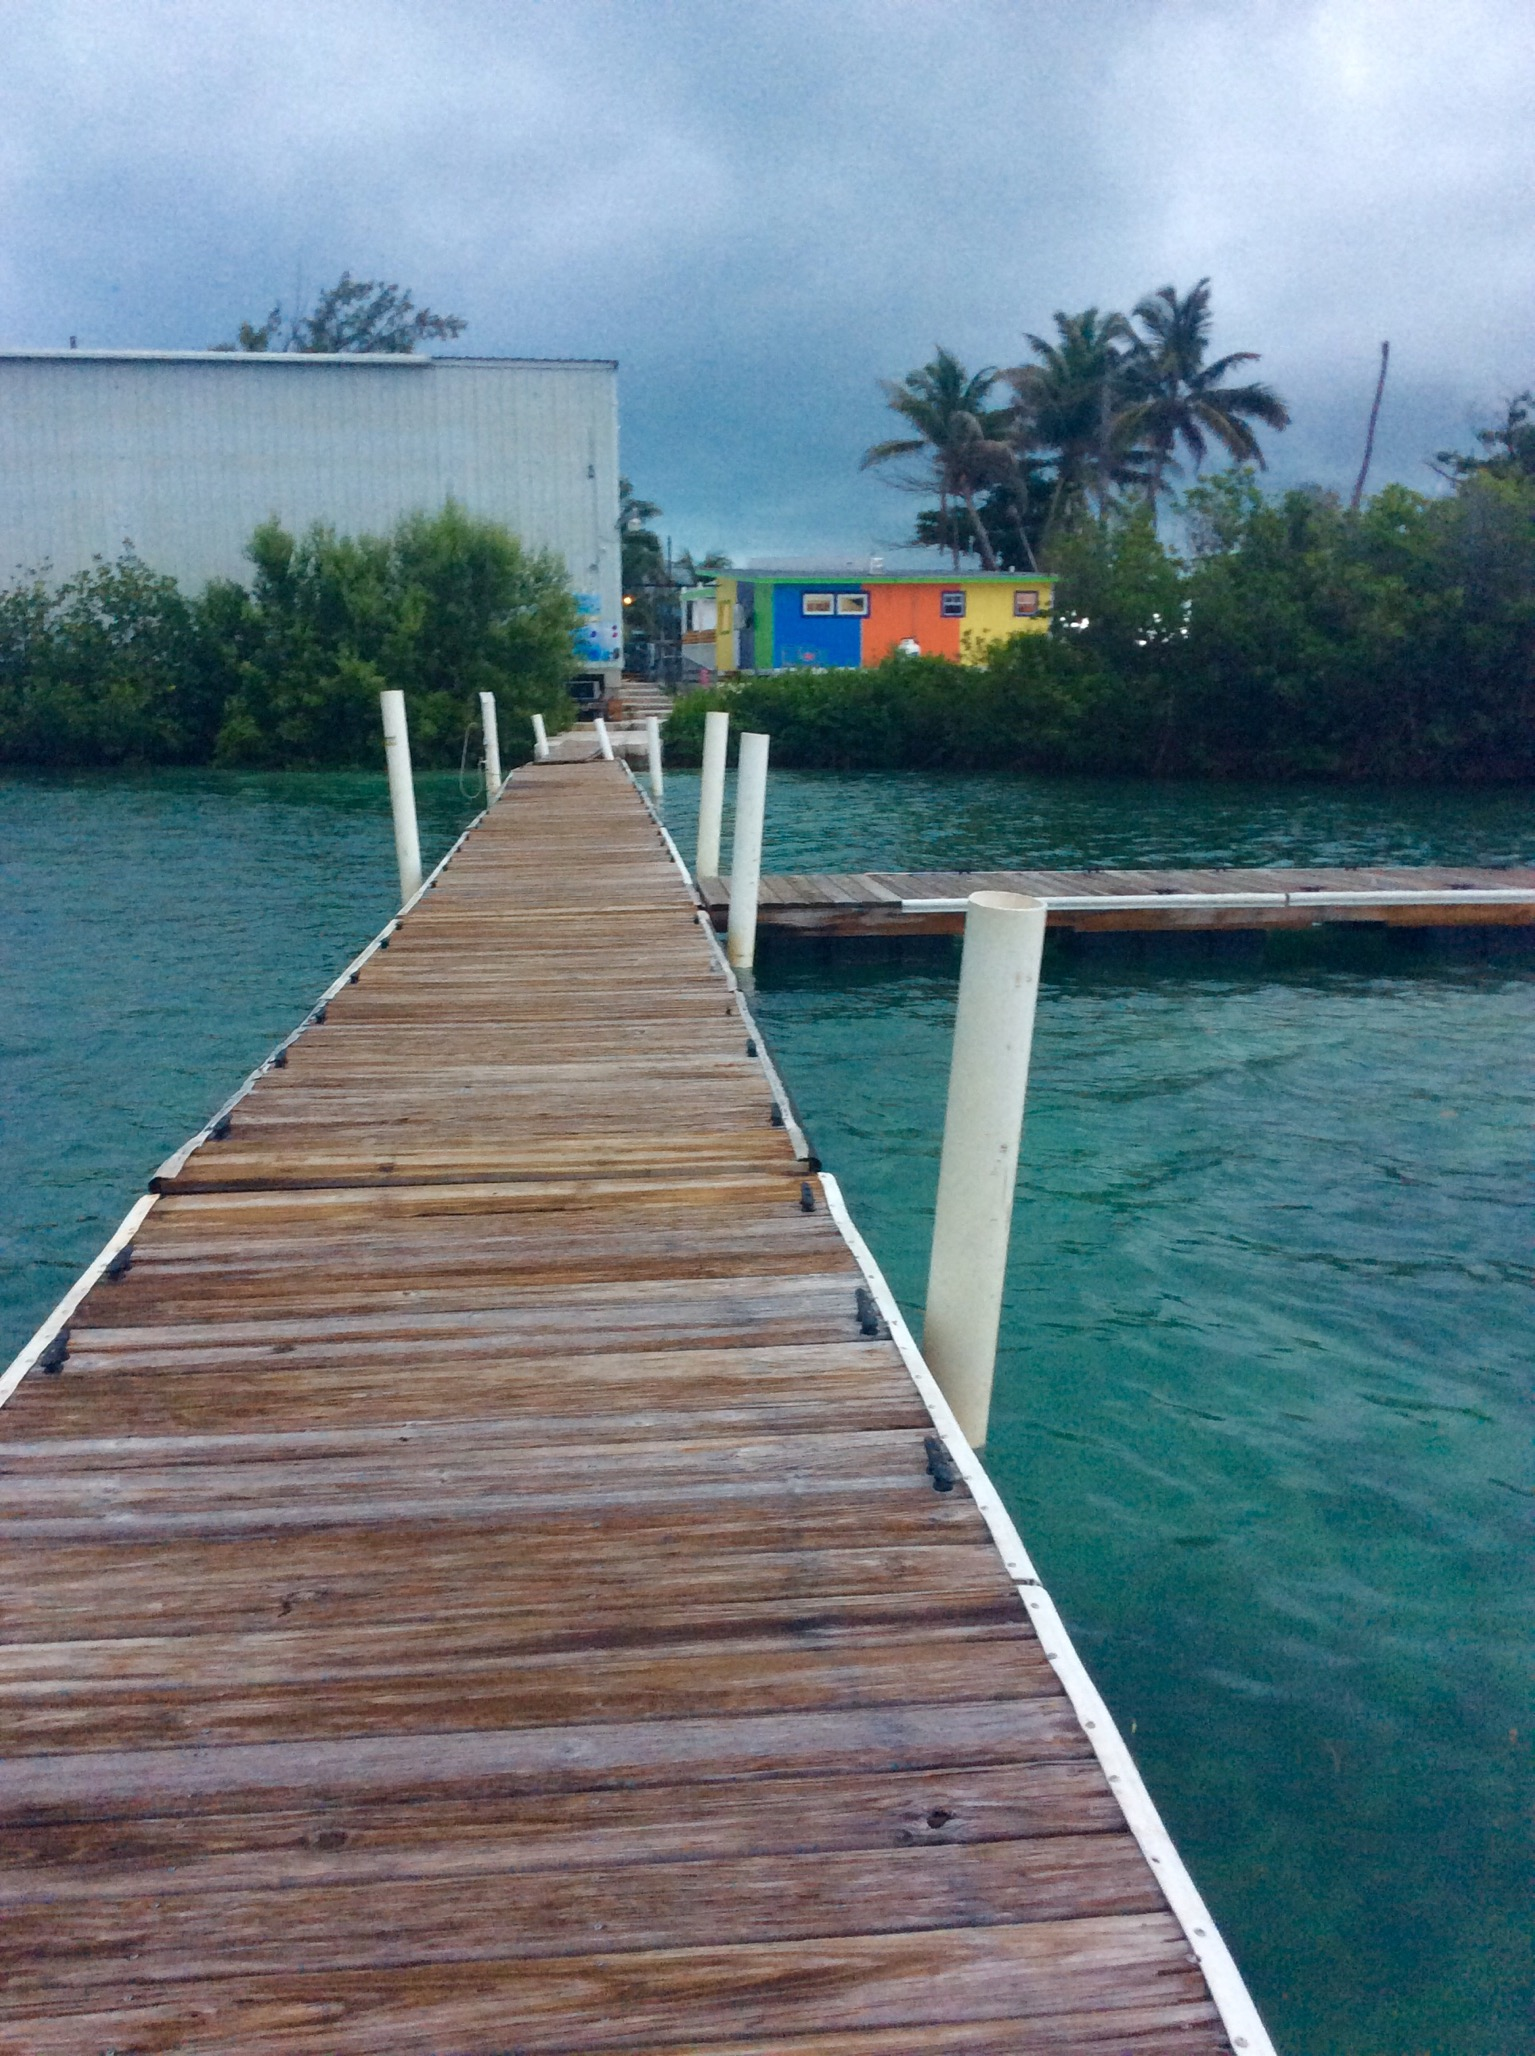 Georgetown dinghy dock, Great Exuma, Bahamas